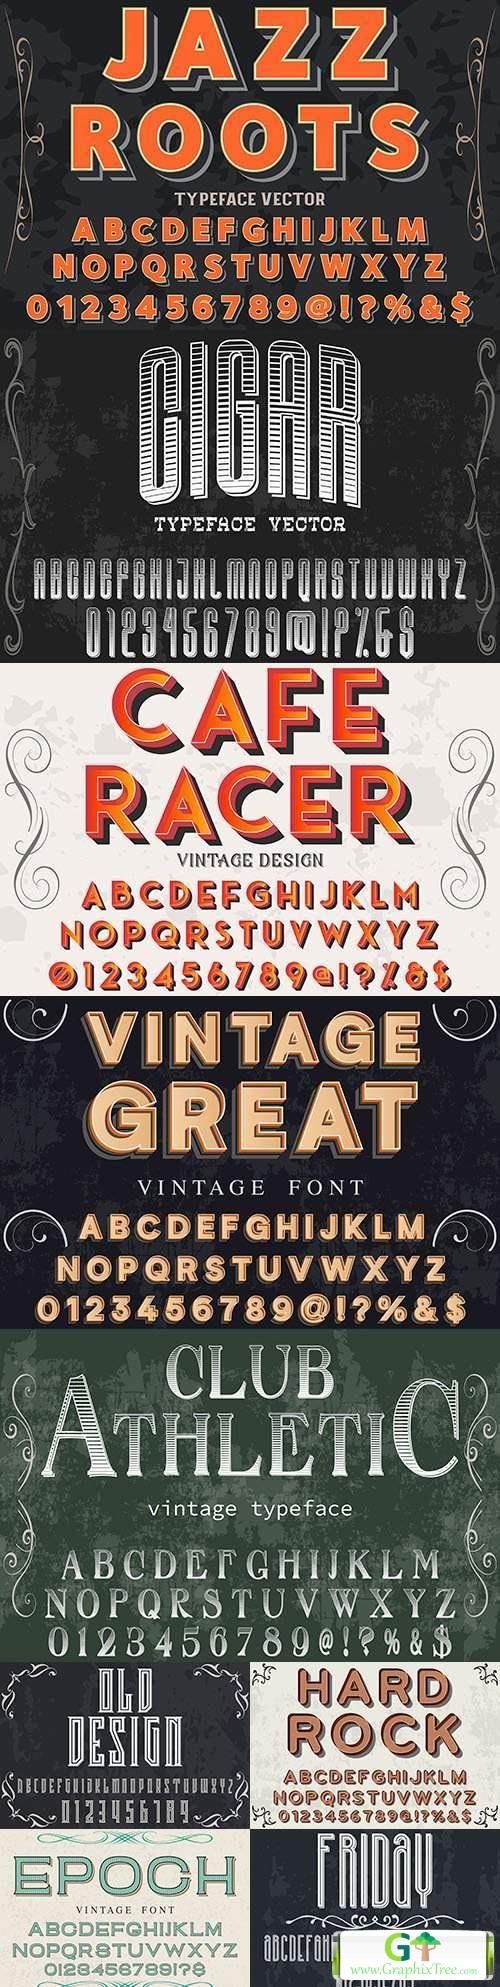 Vintage font effect text with alphabet illustration design